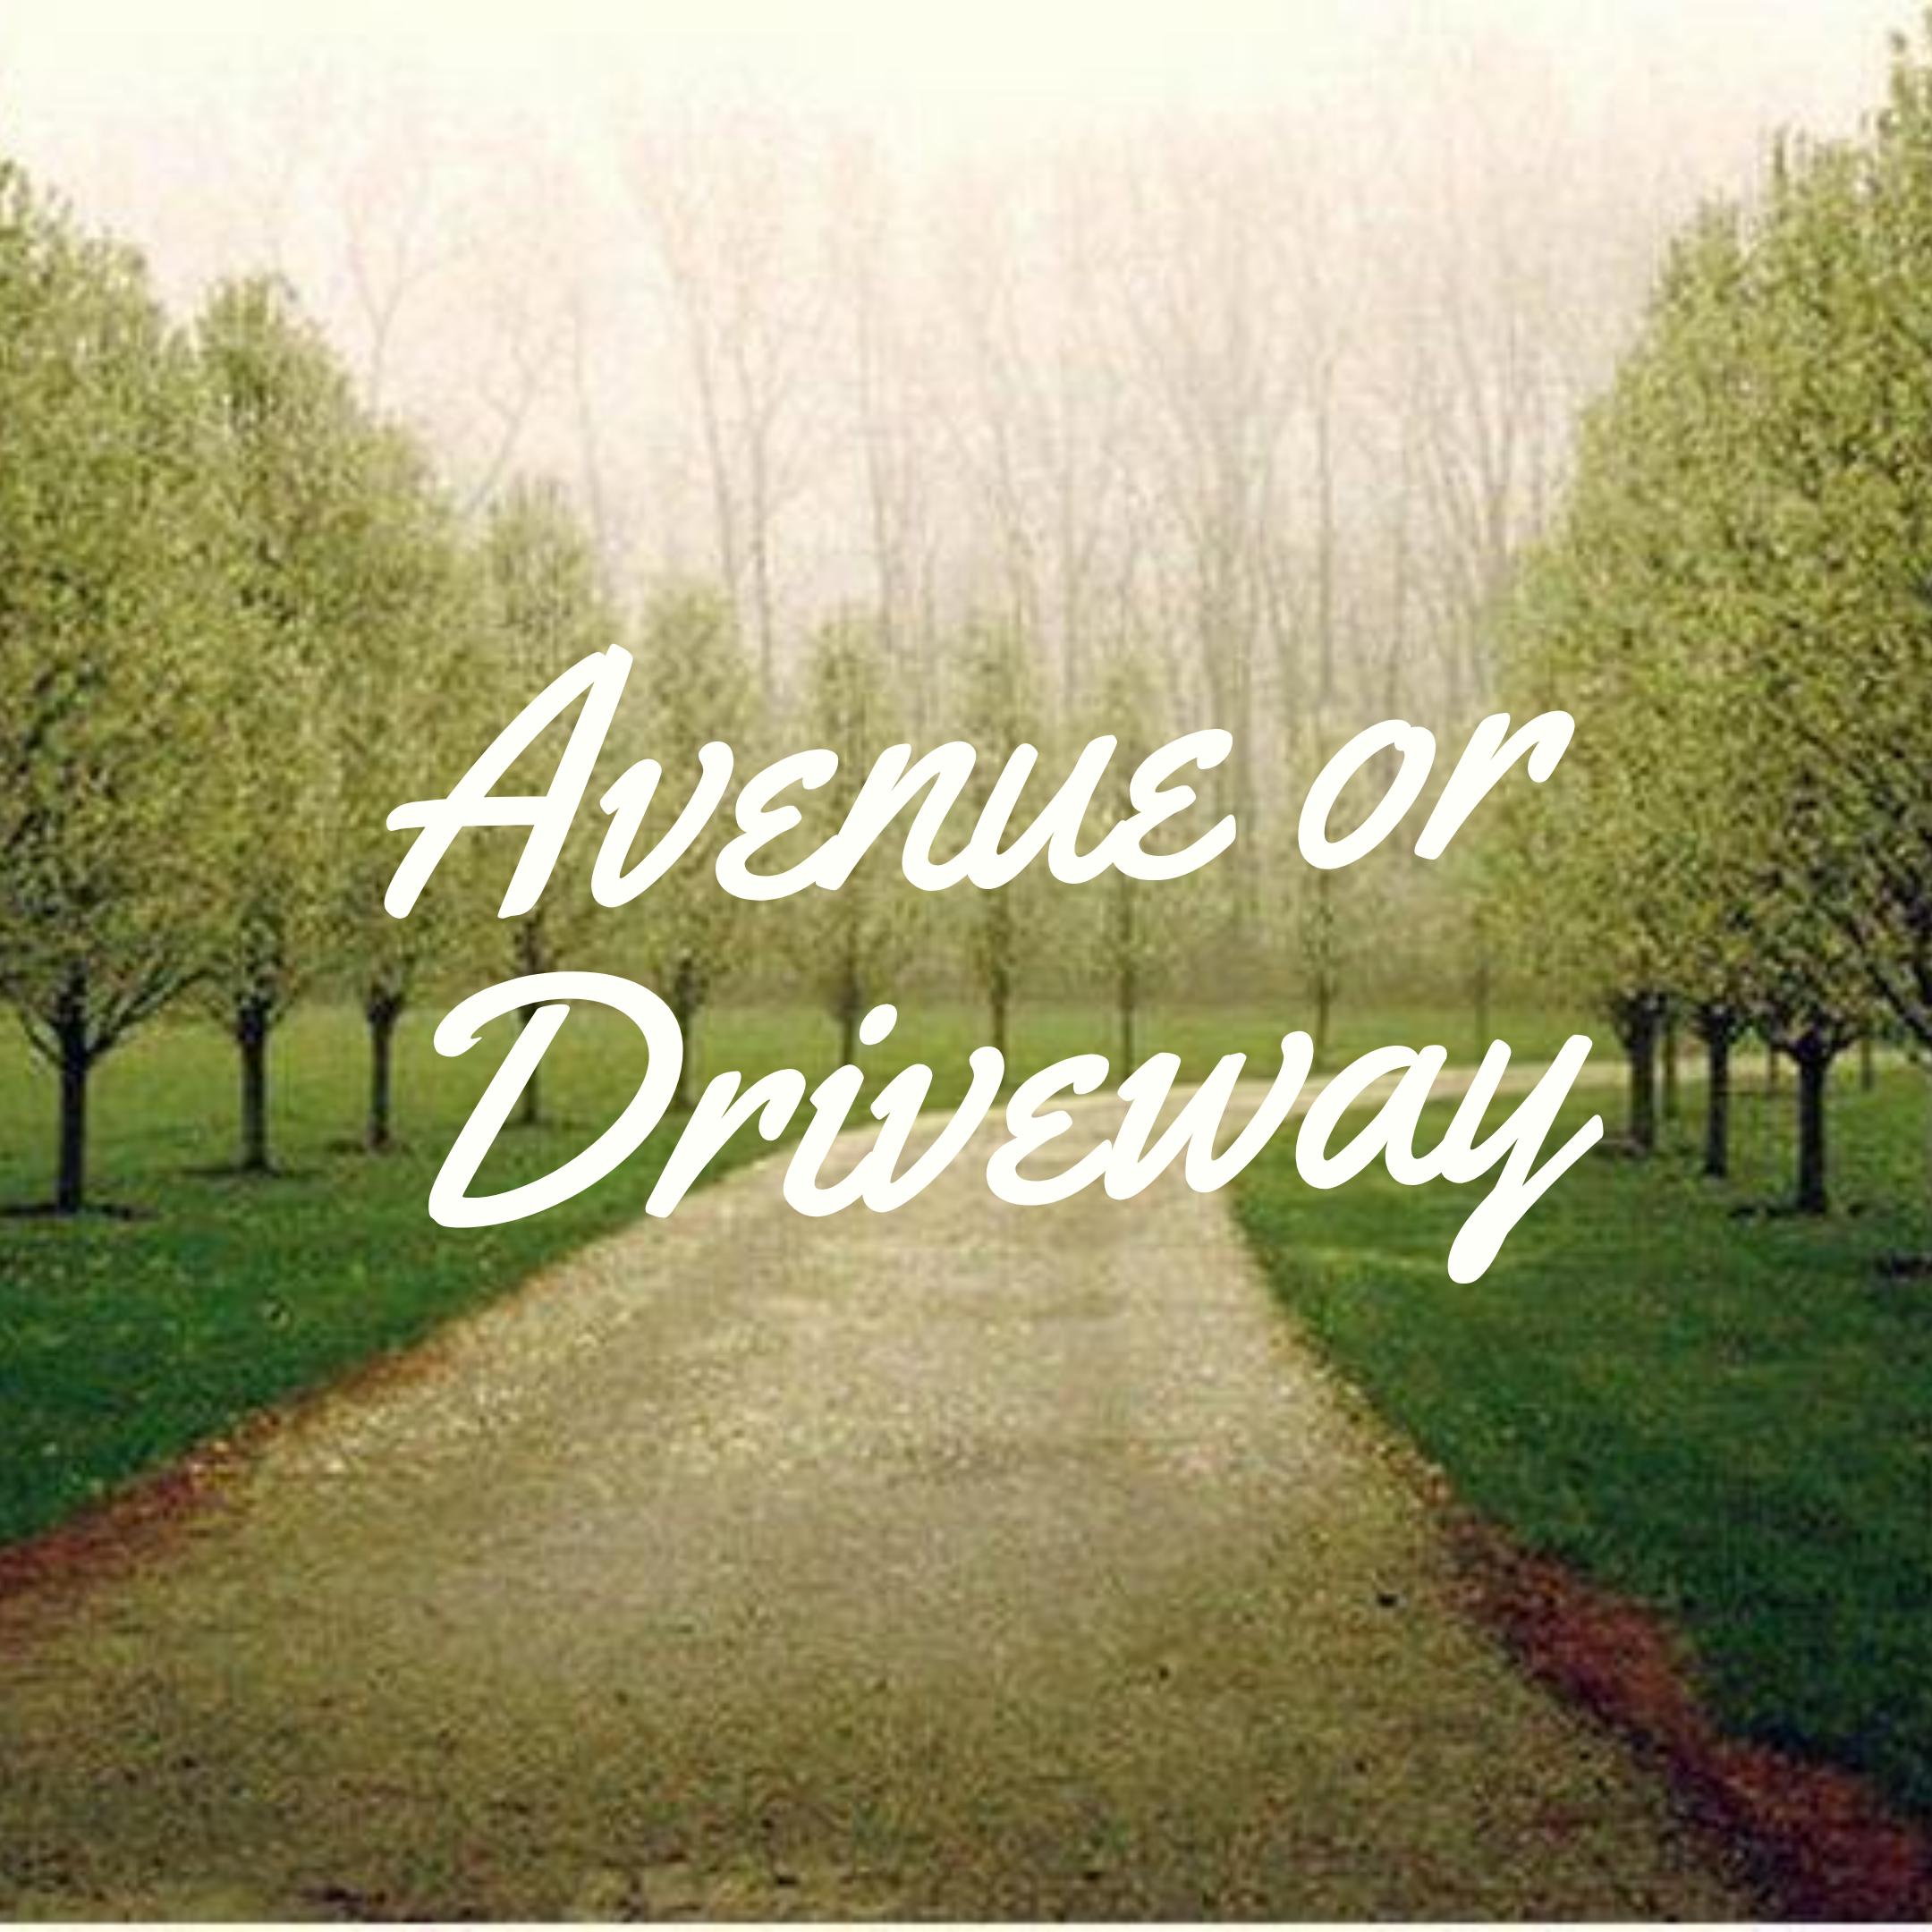 Avenue or Driveway